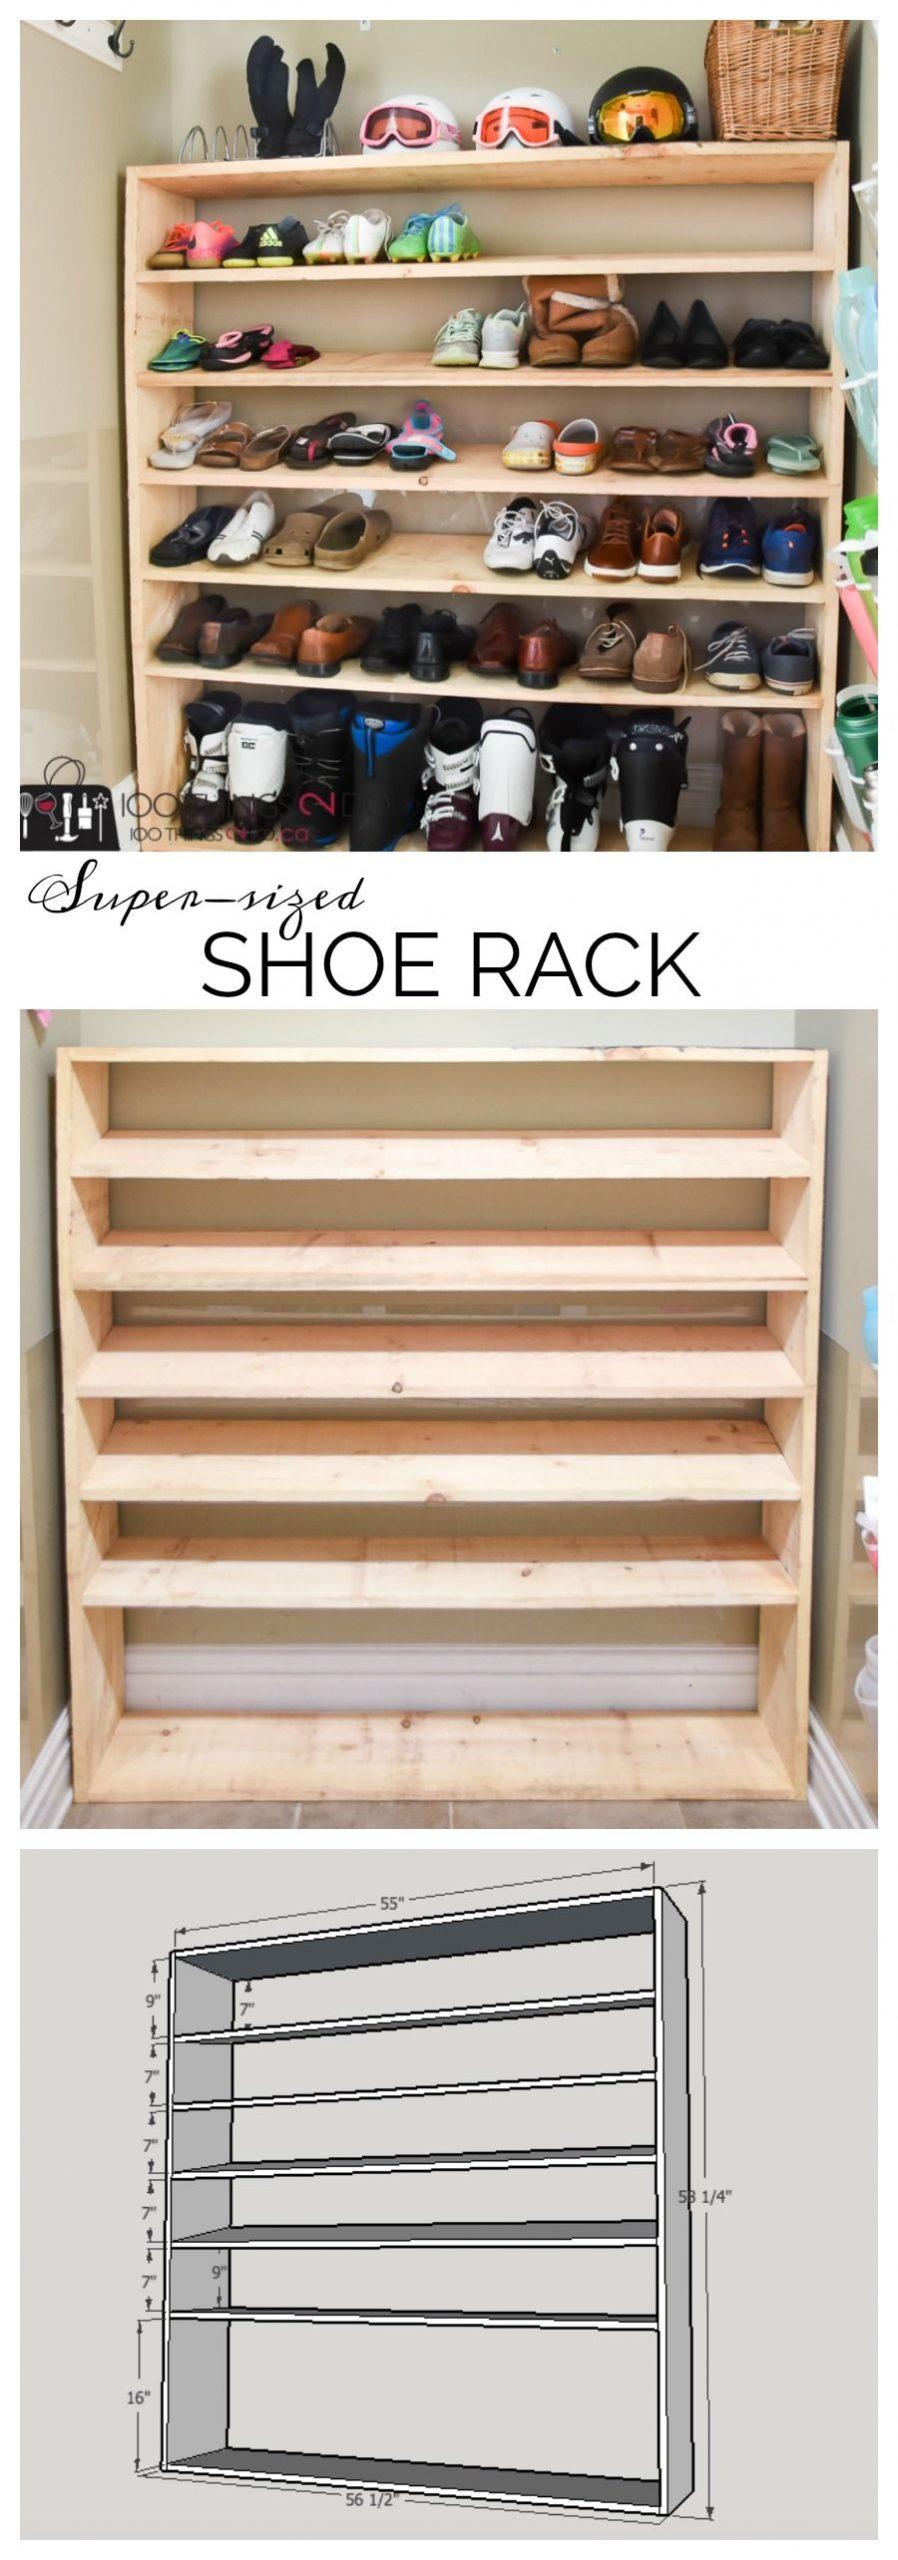 How to make a super-sized shoe rack on a budget